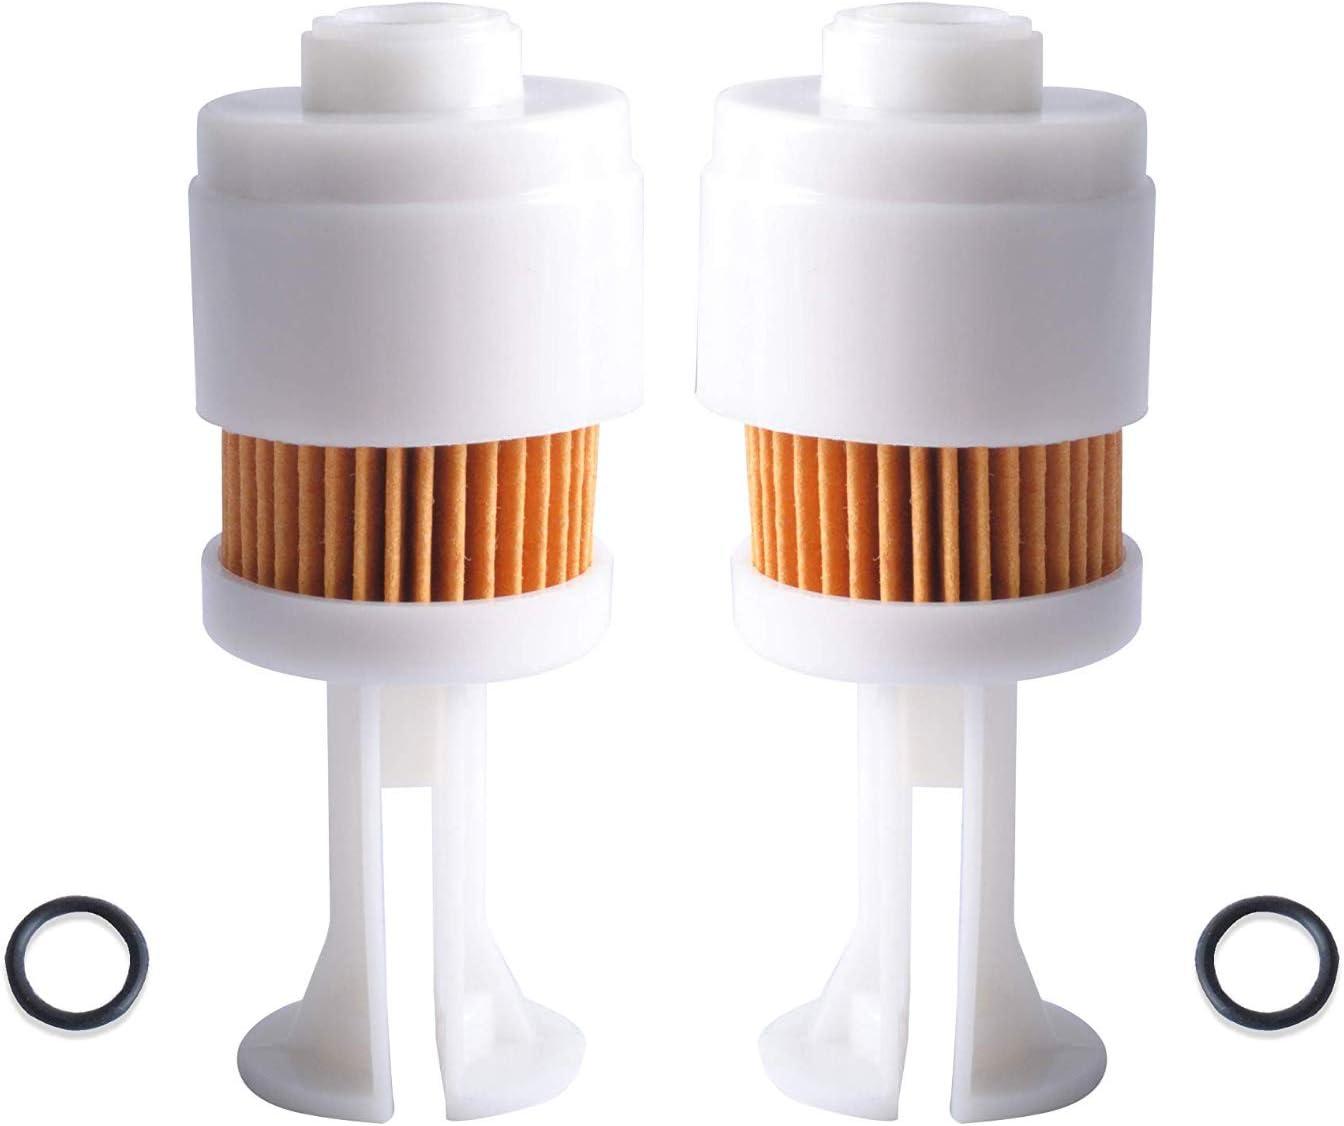 Poweka Fuel Filter for Yamaha 65L-24563-00-00 Suzuki 15412-93J00 Mercury Marine 35-888289T2 Johnson Evinrude OMC 5065695 Sierra 18-7936,Pack of 2